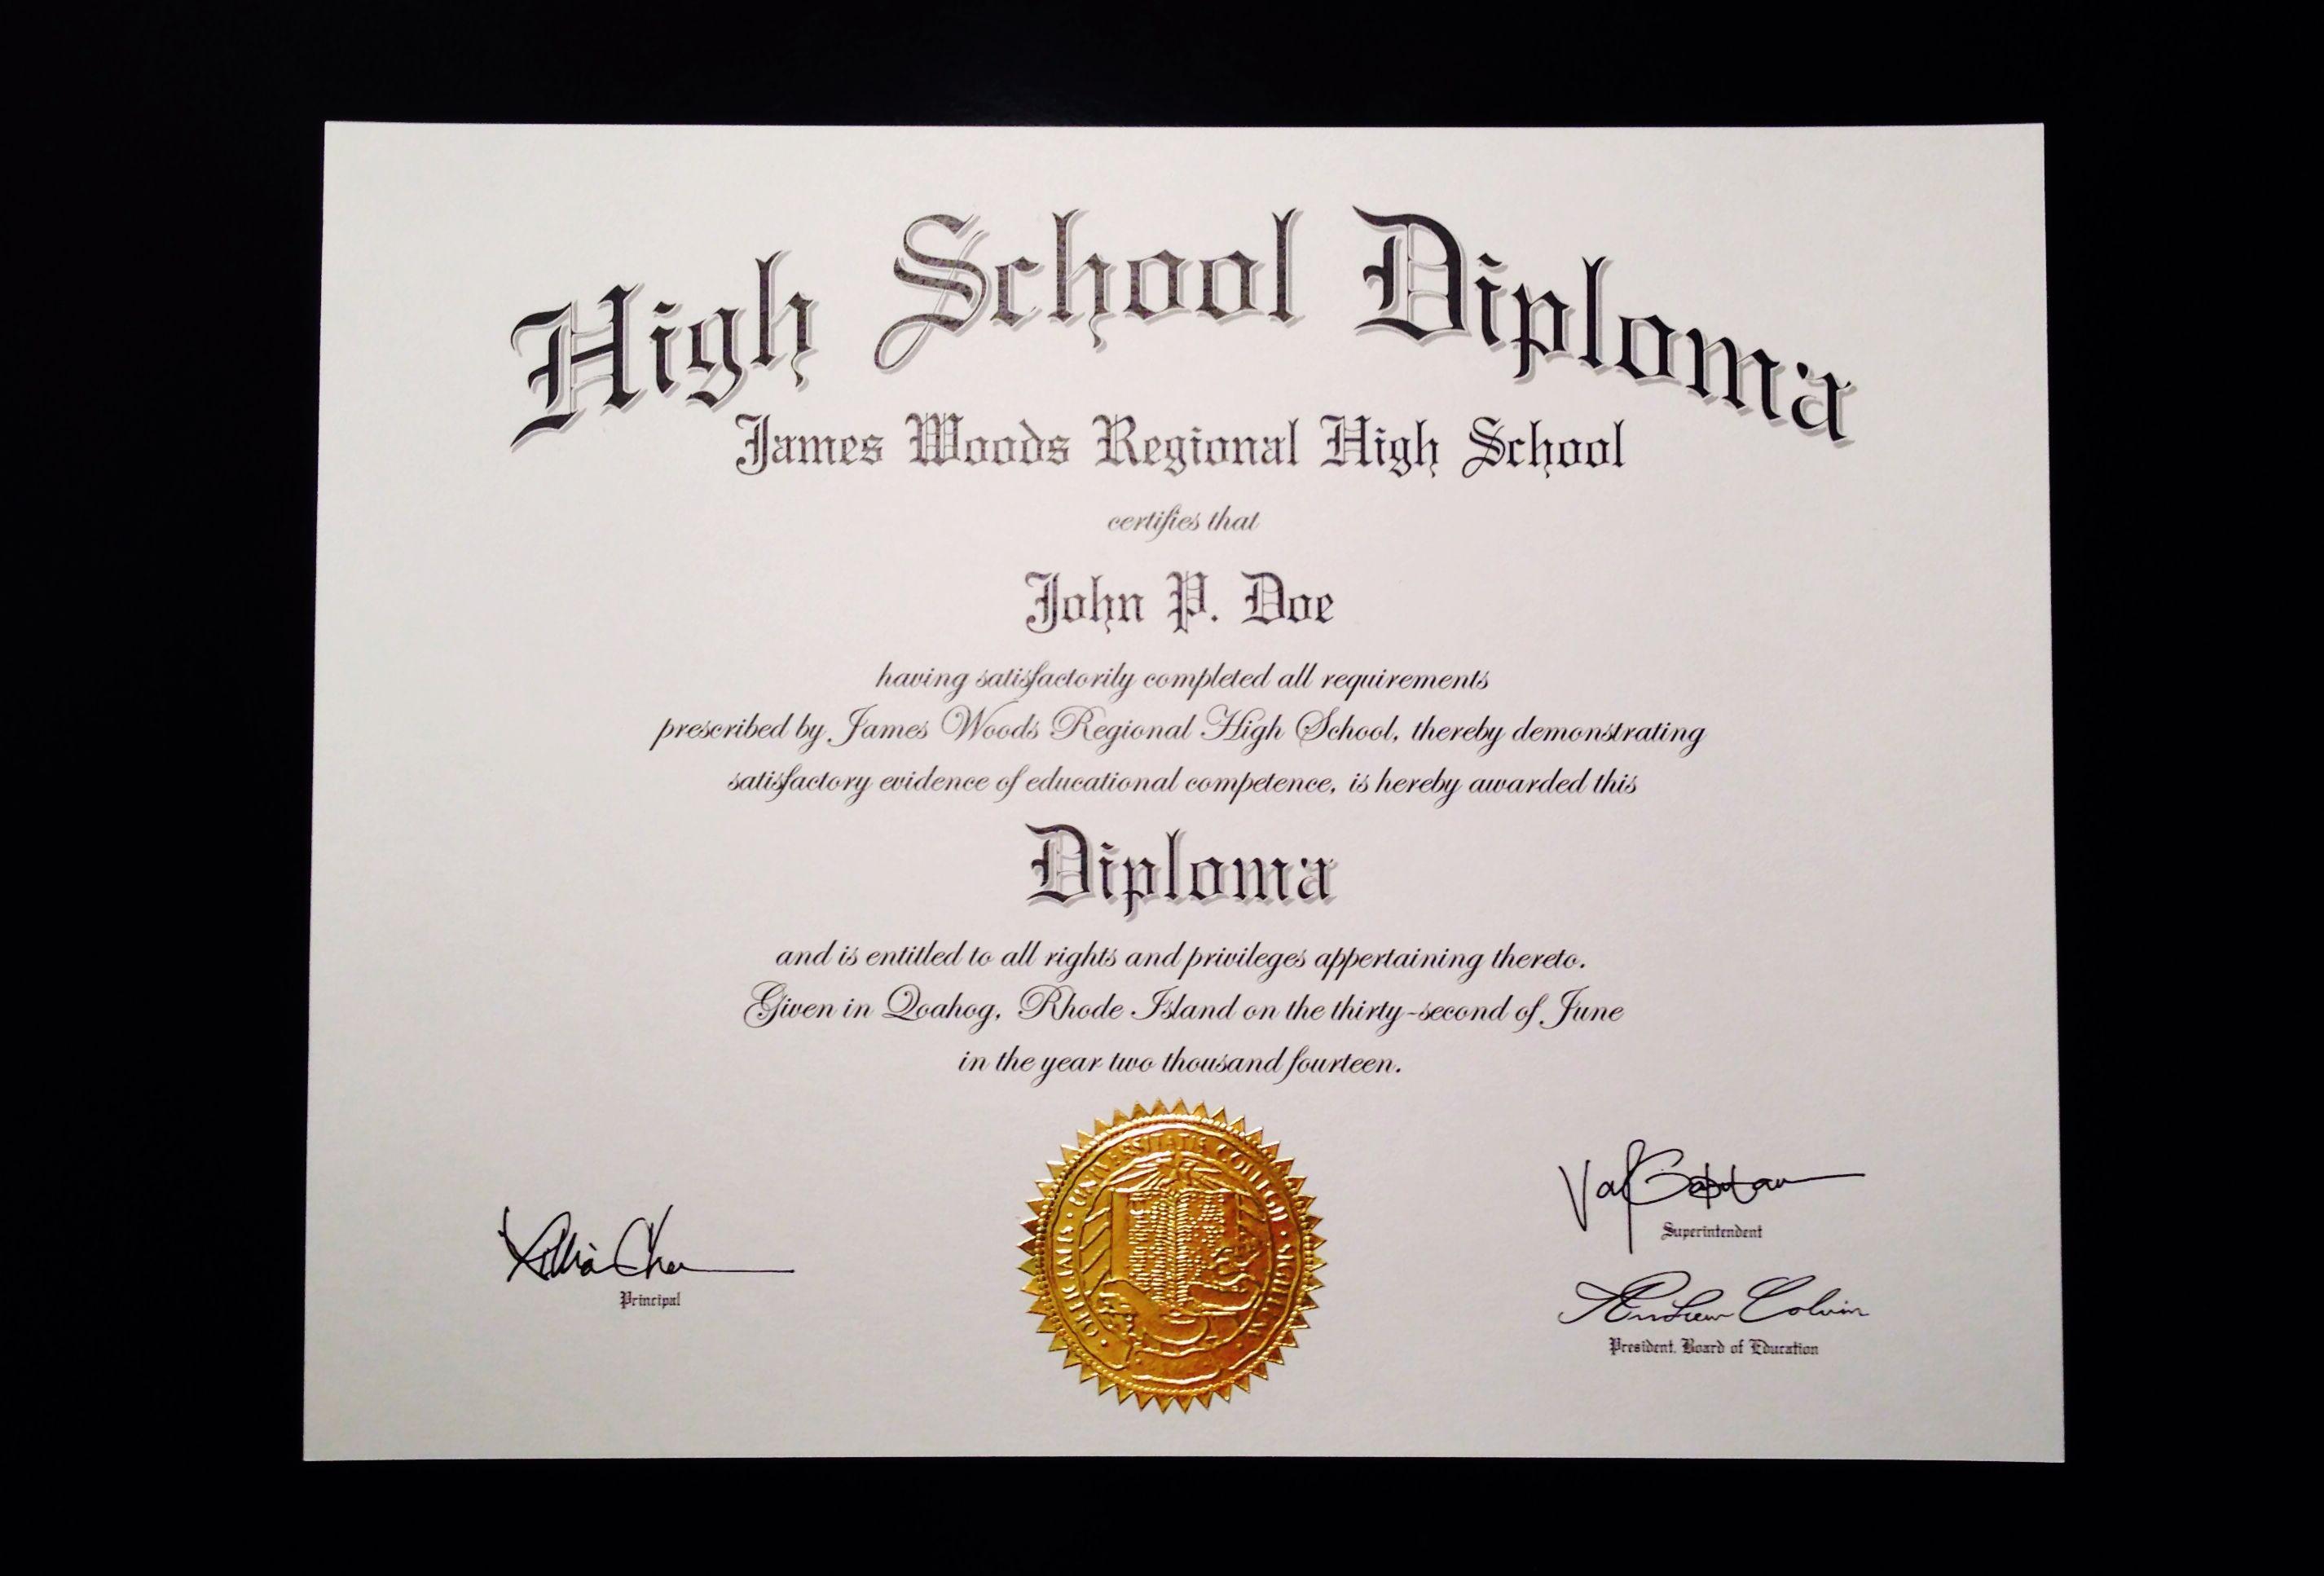 School Certificate Template Free Printable Certificates | Diploma - Printable Fake Ged Certificate For Free